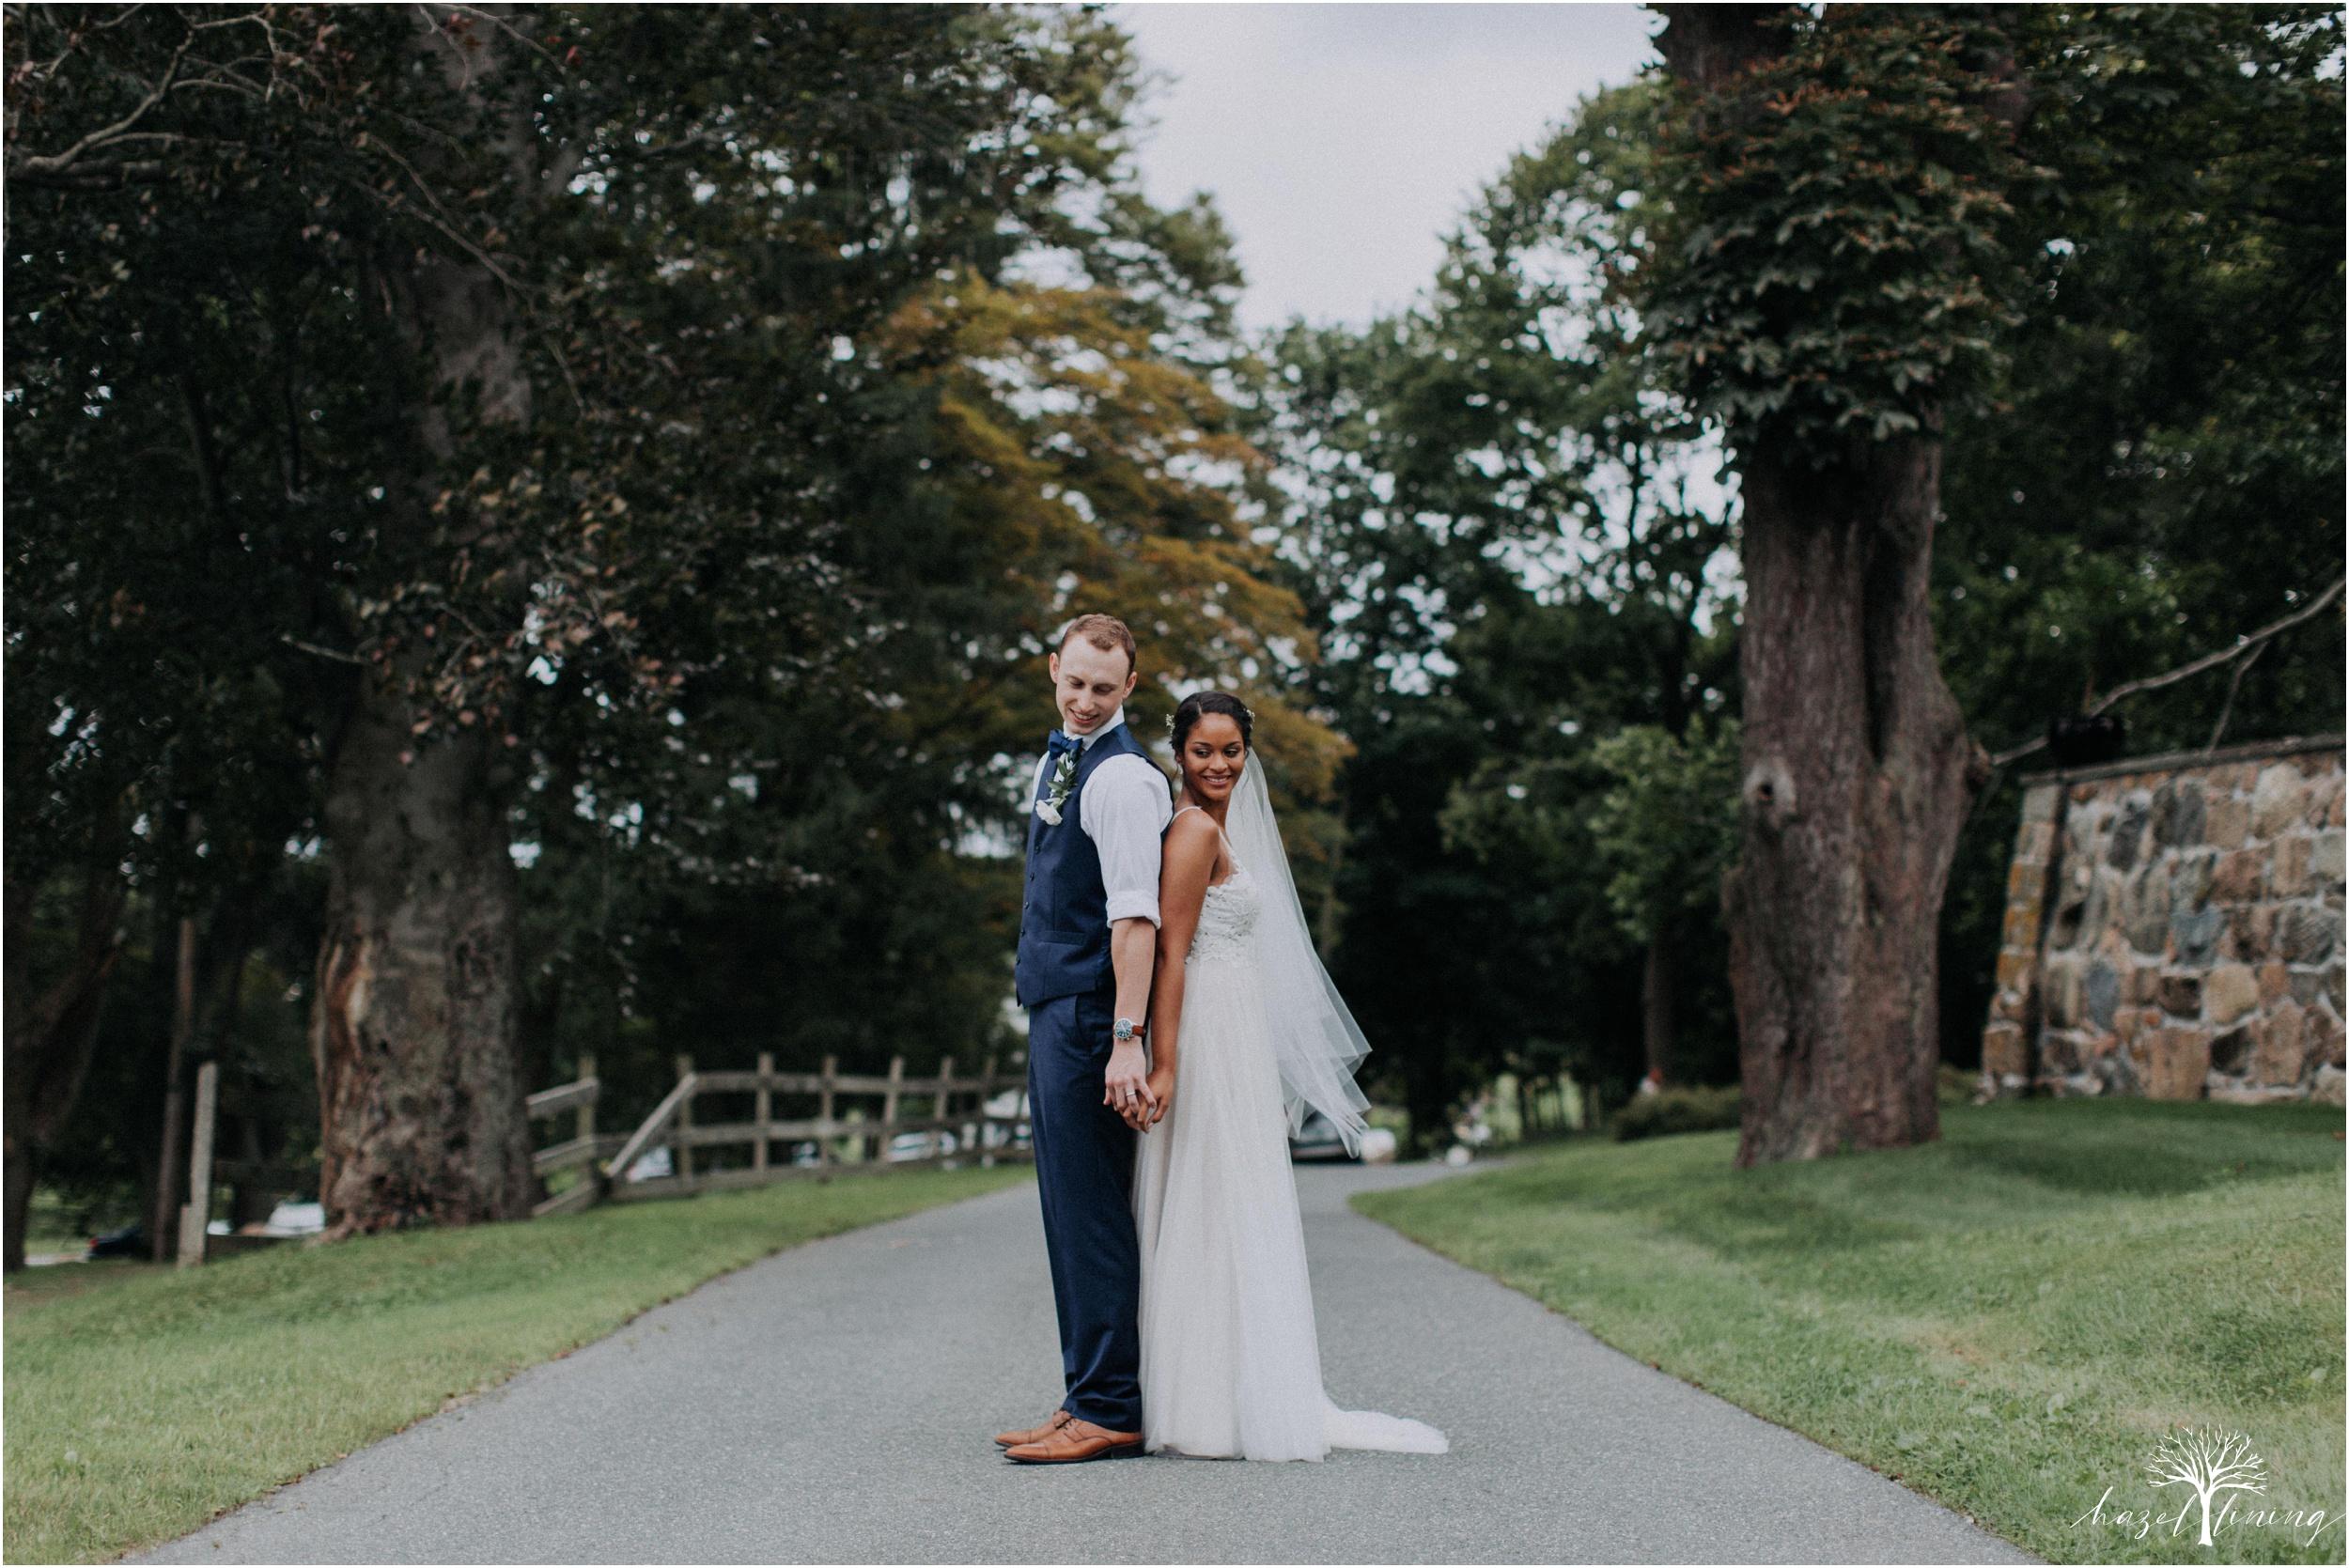 mariah-kreyling-samuel-sherratt-sherrattwiththeworld-peirce-farm-at-witch-hill-boston-massachusetts-wedding-photography-hazel-lining-travel-wedding-elopement-photography_0136.jpg